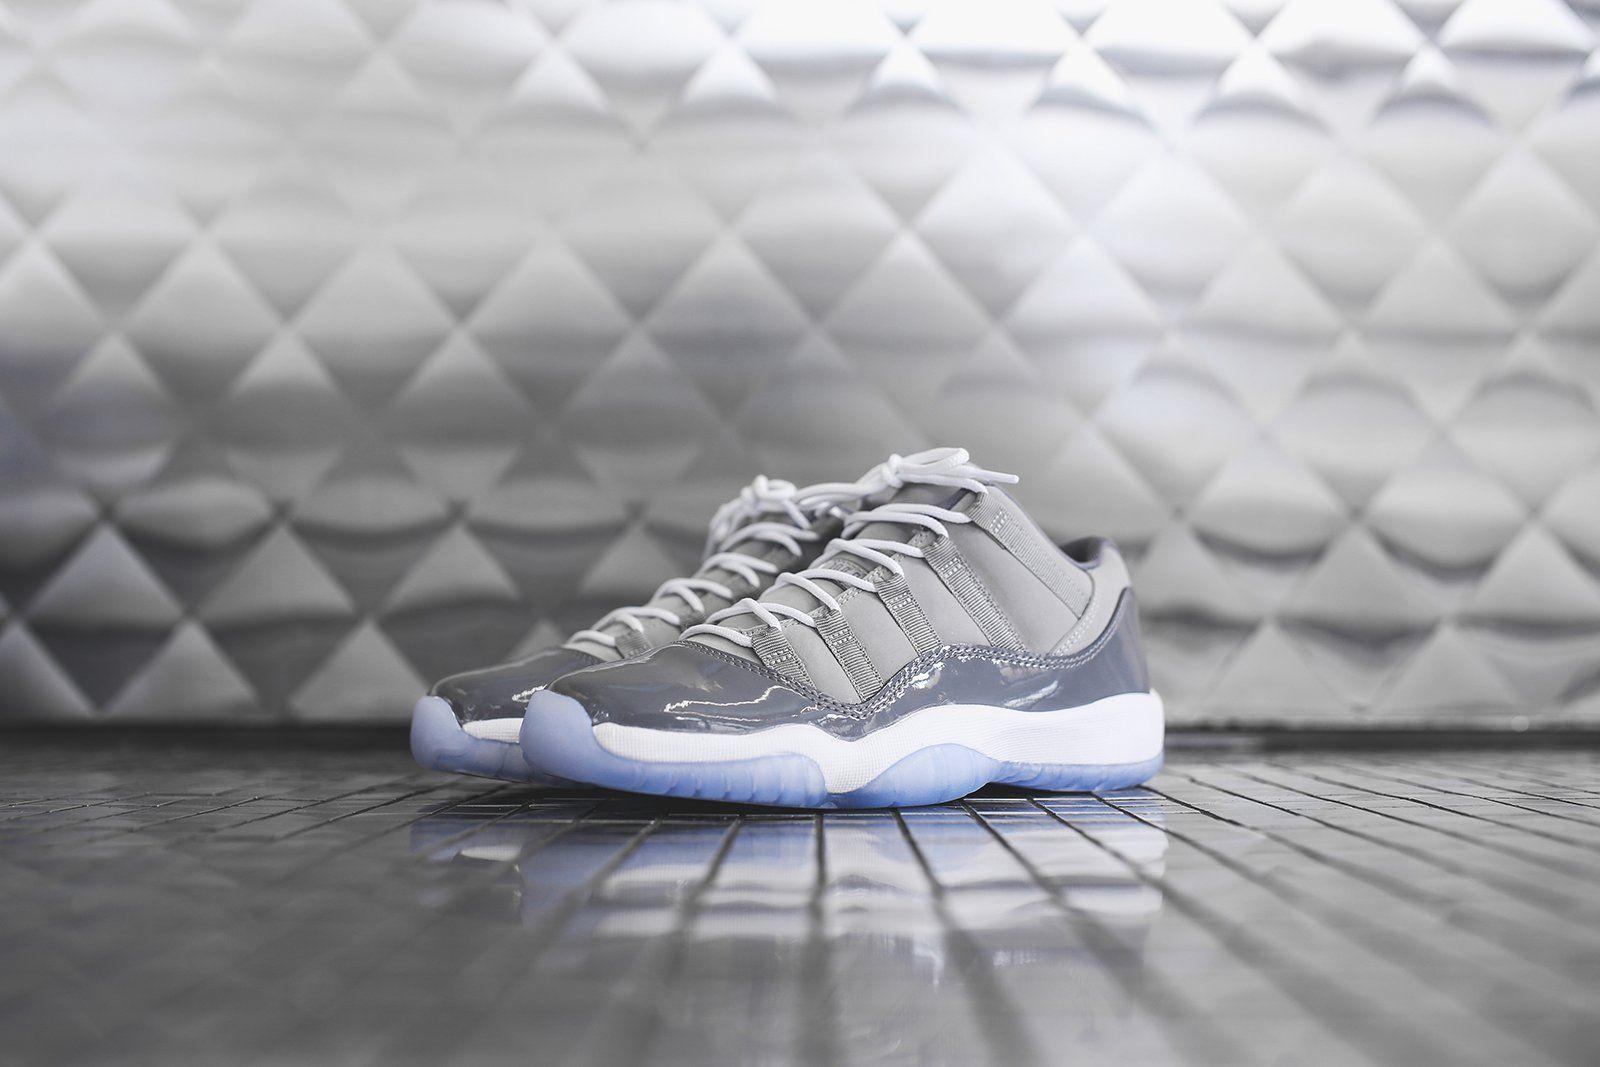 sports shoes bd8fa b0729 Nike GS Air Jordan 11 Retro Low - Cool Grey